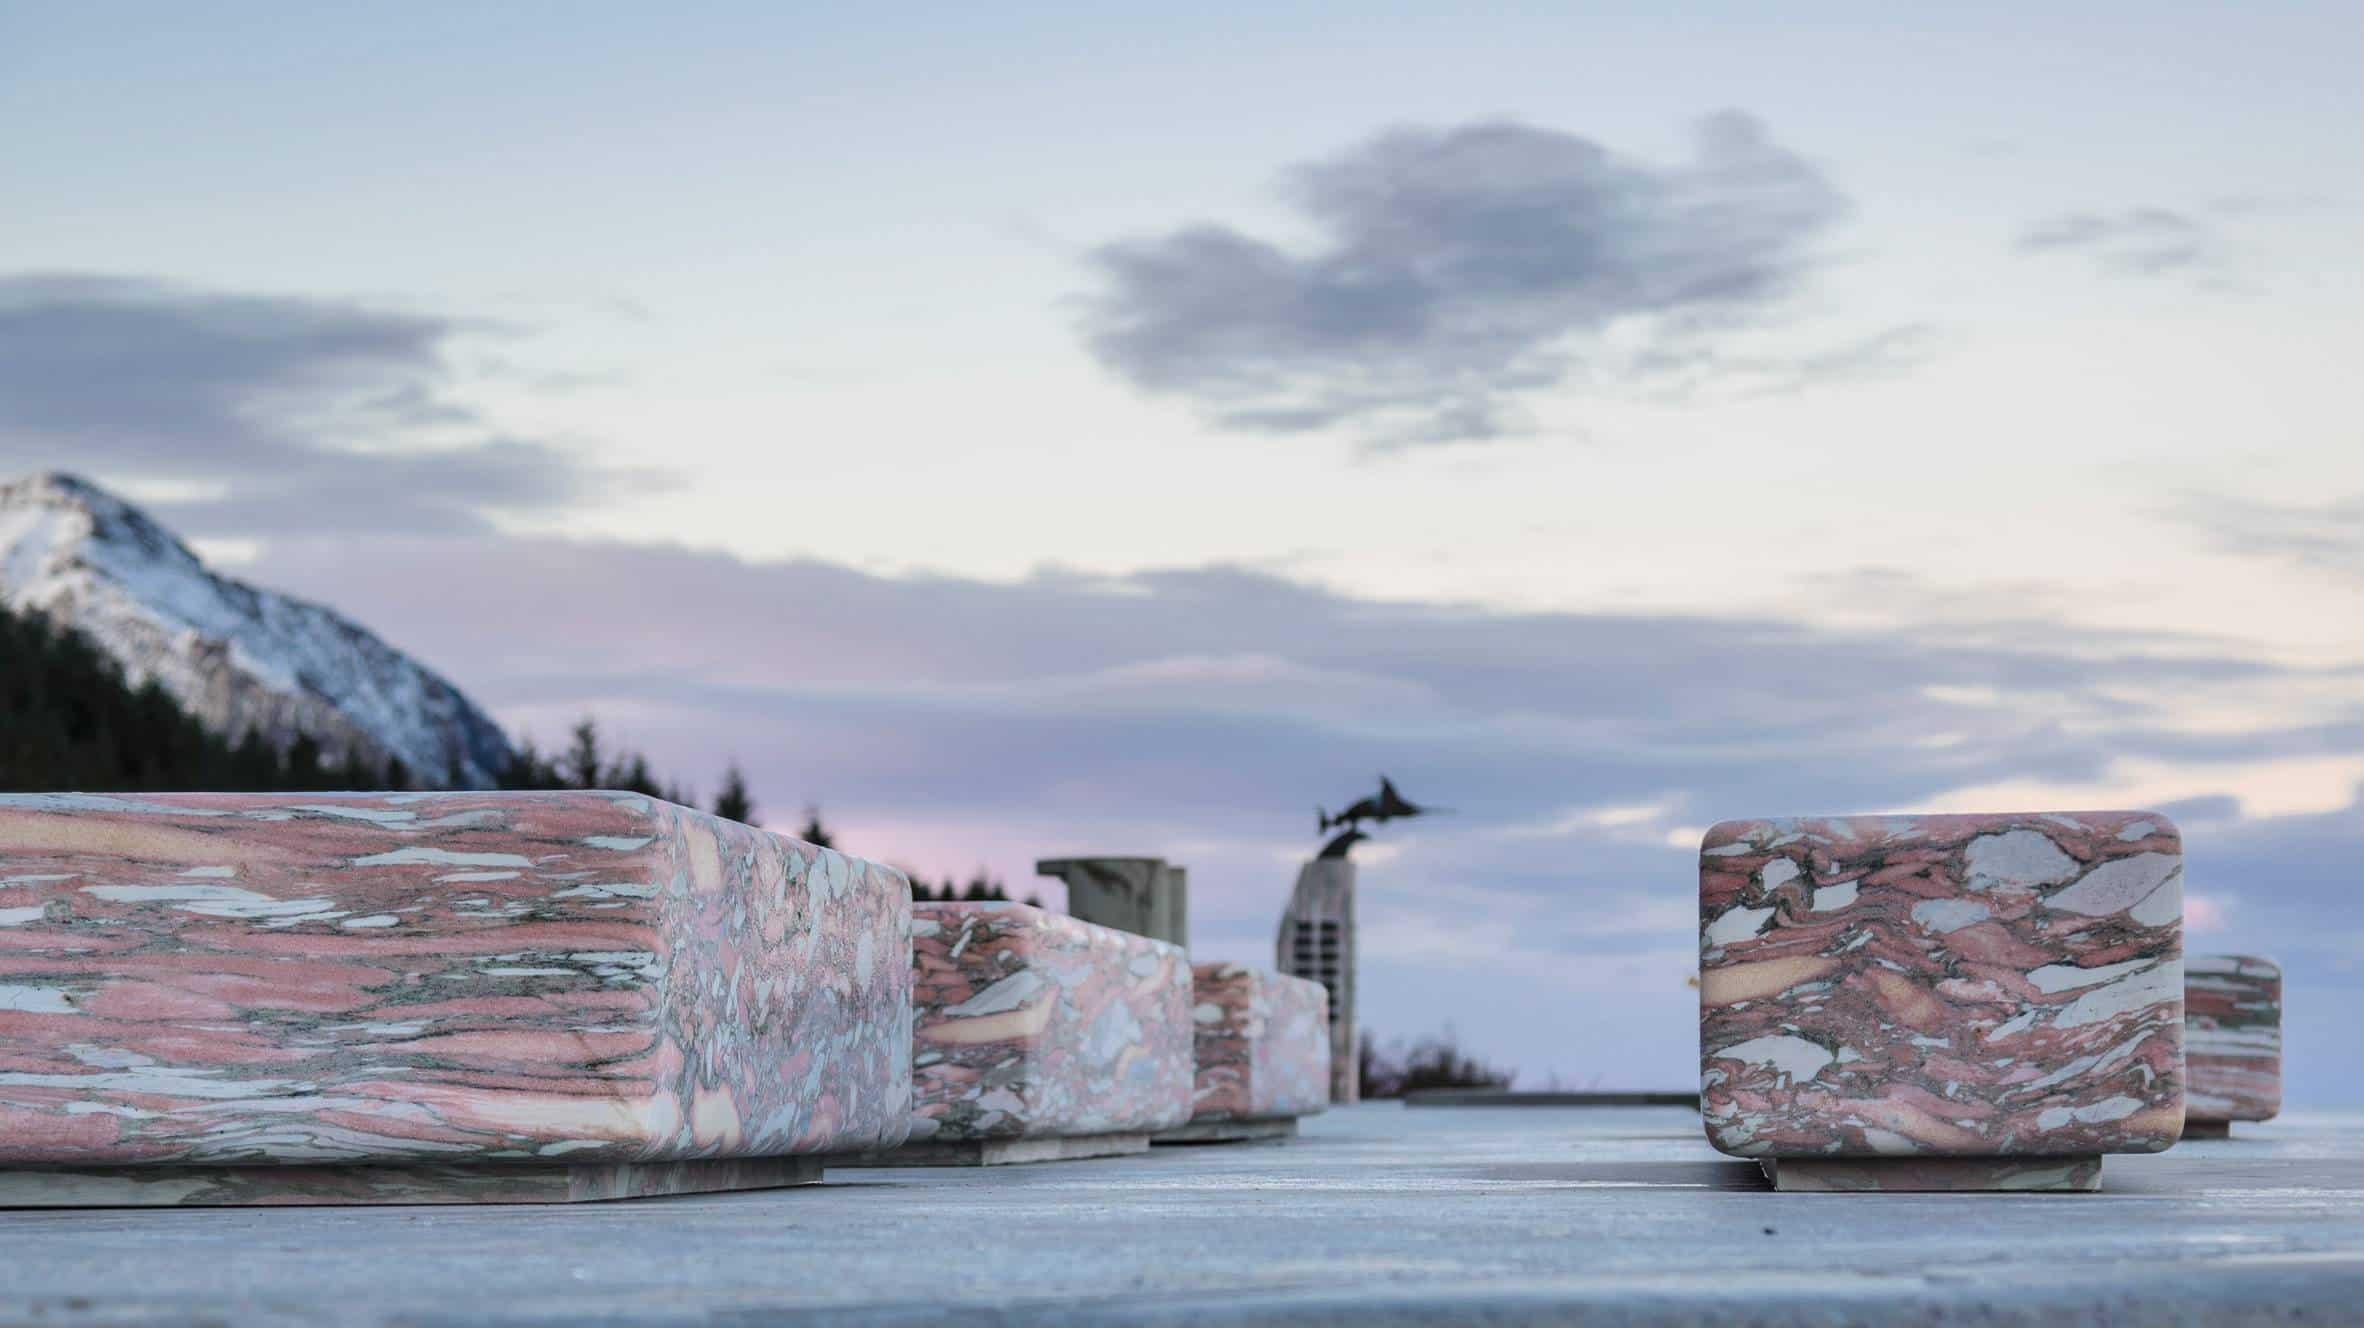 haugen zohar arkitekter hza wave shaped toilet facility norwegian scenic route 9